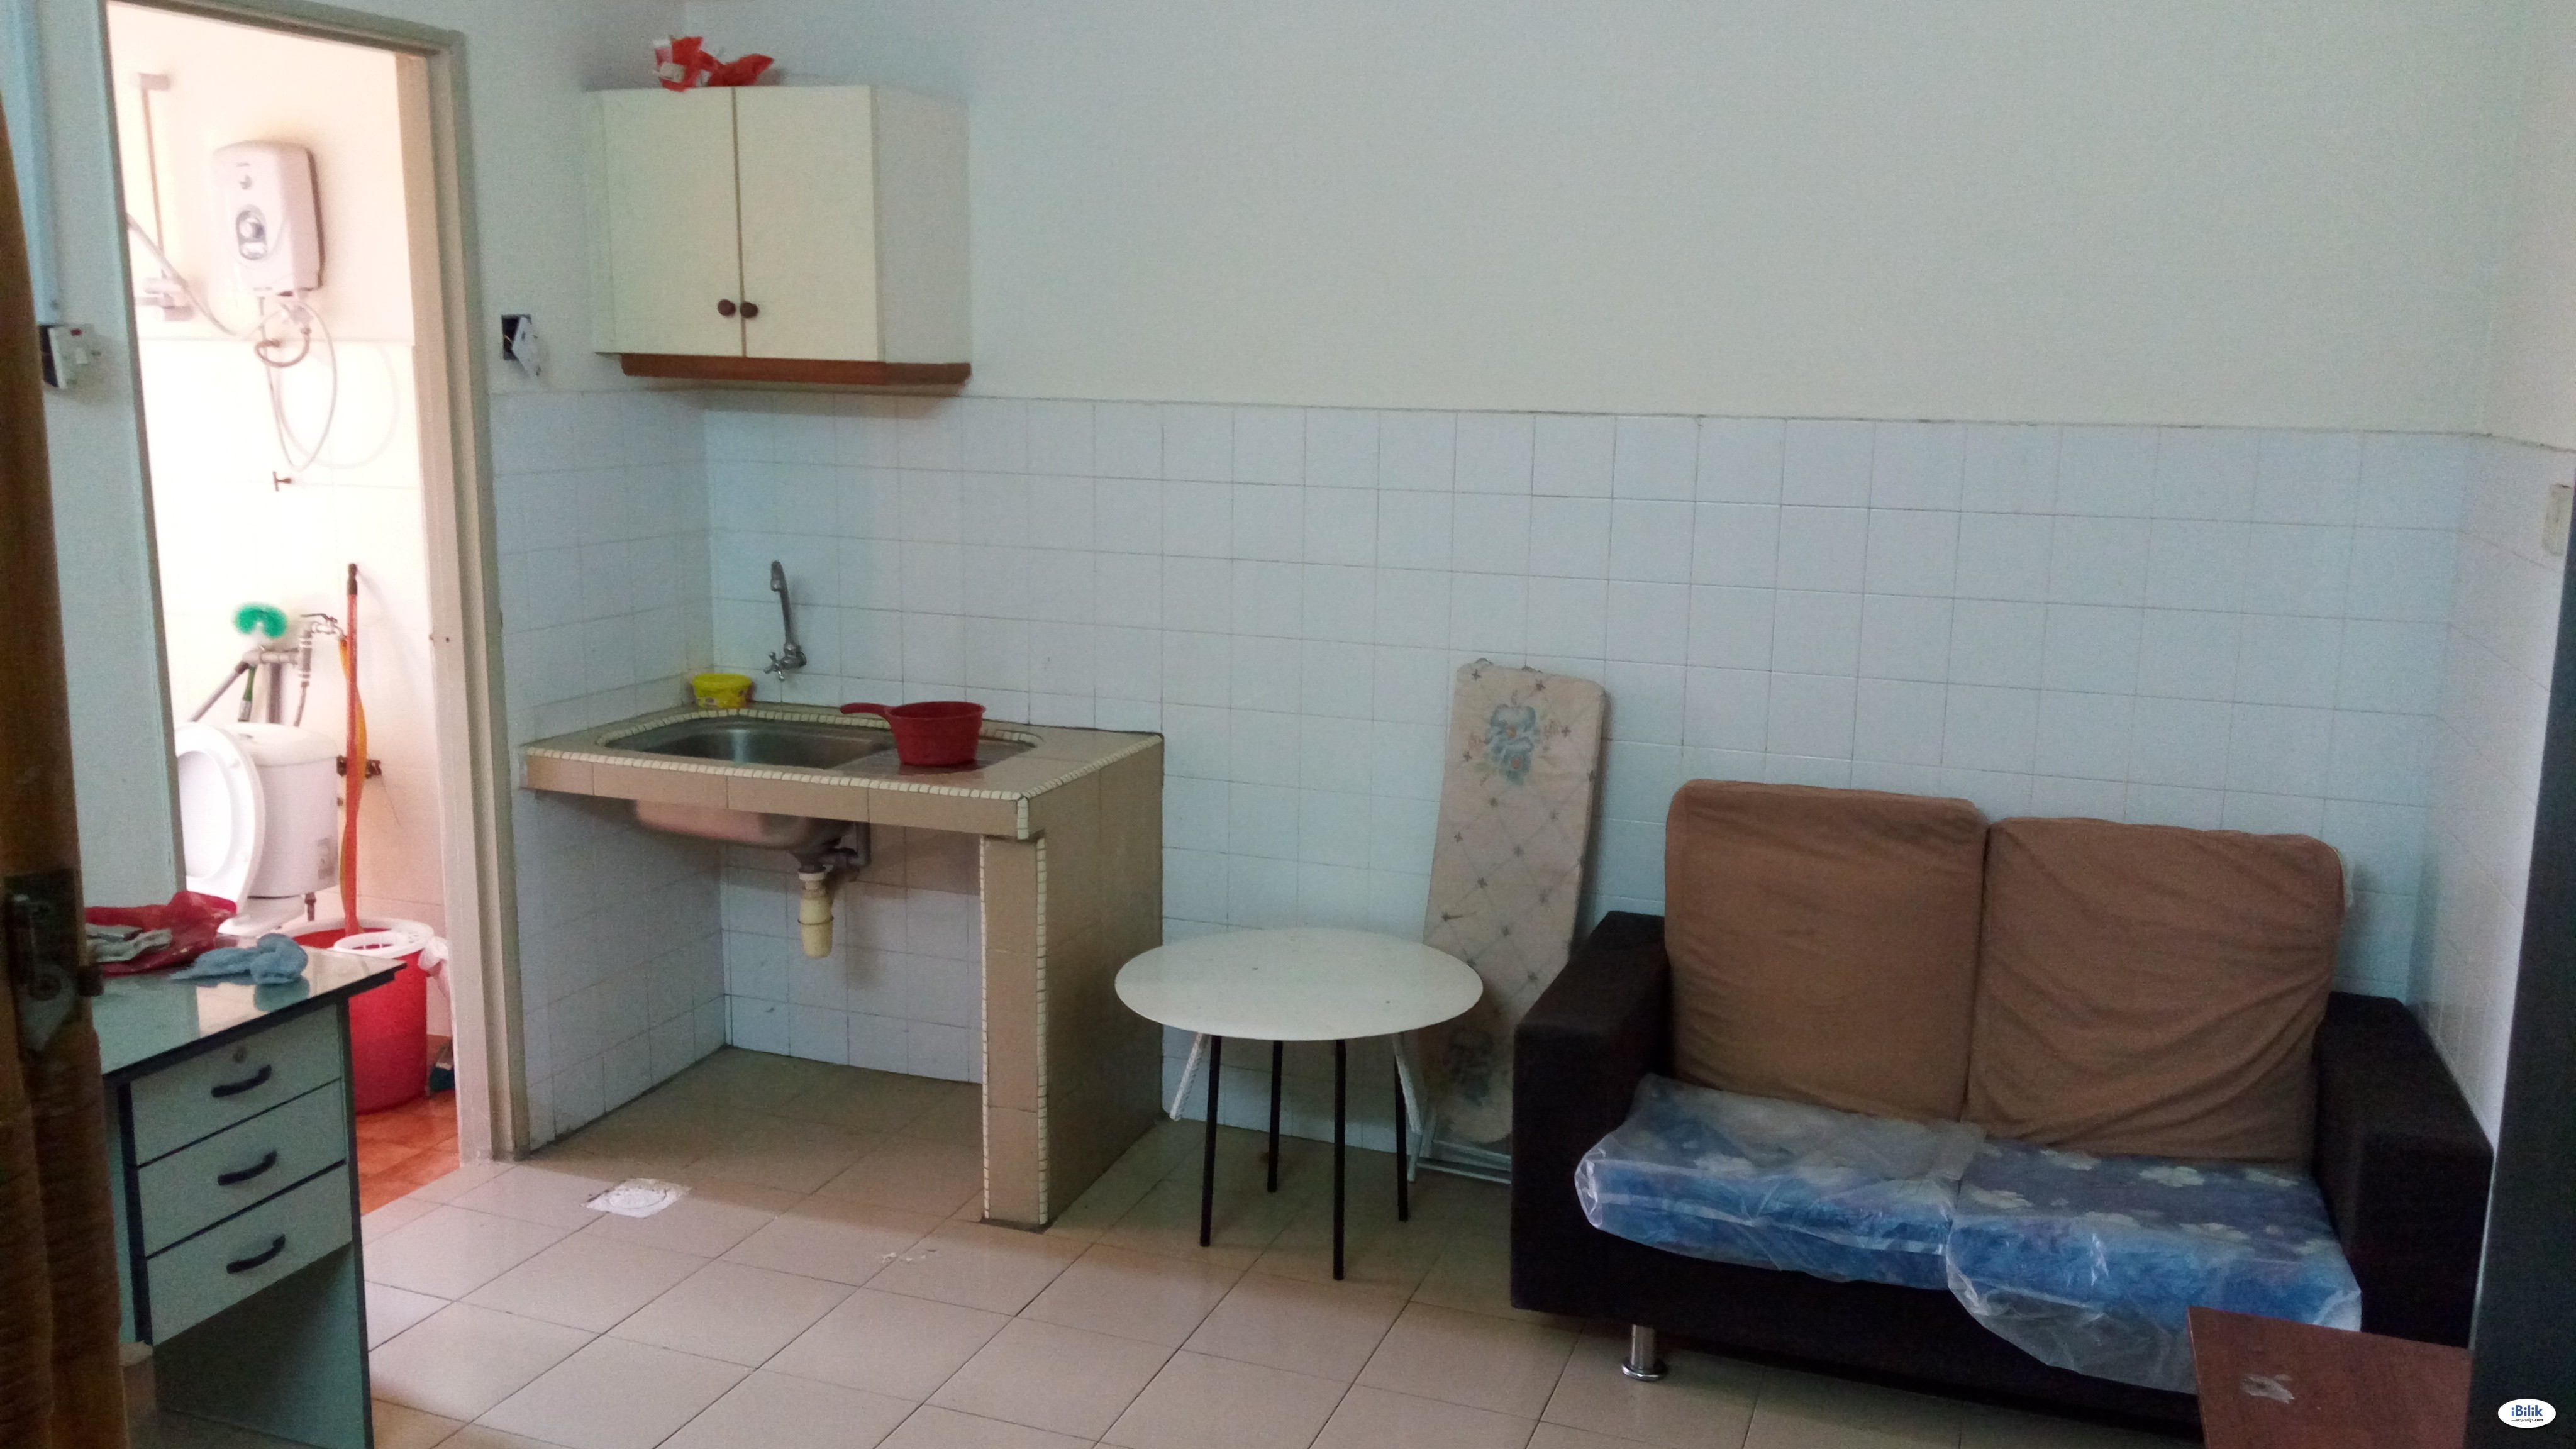 [ZERO DEPOSIT] Middle Room at Bandar Sunway, Petaling Jaya